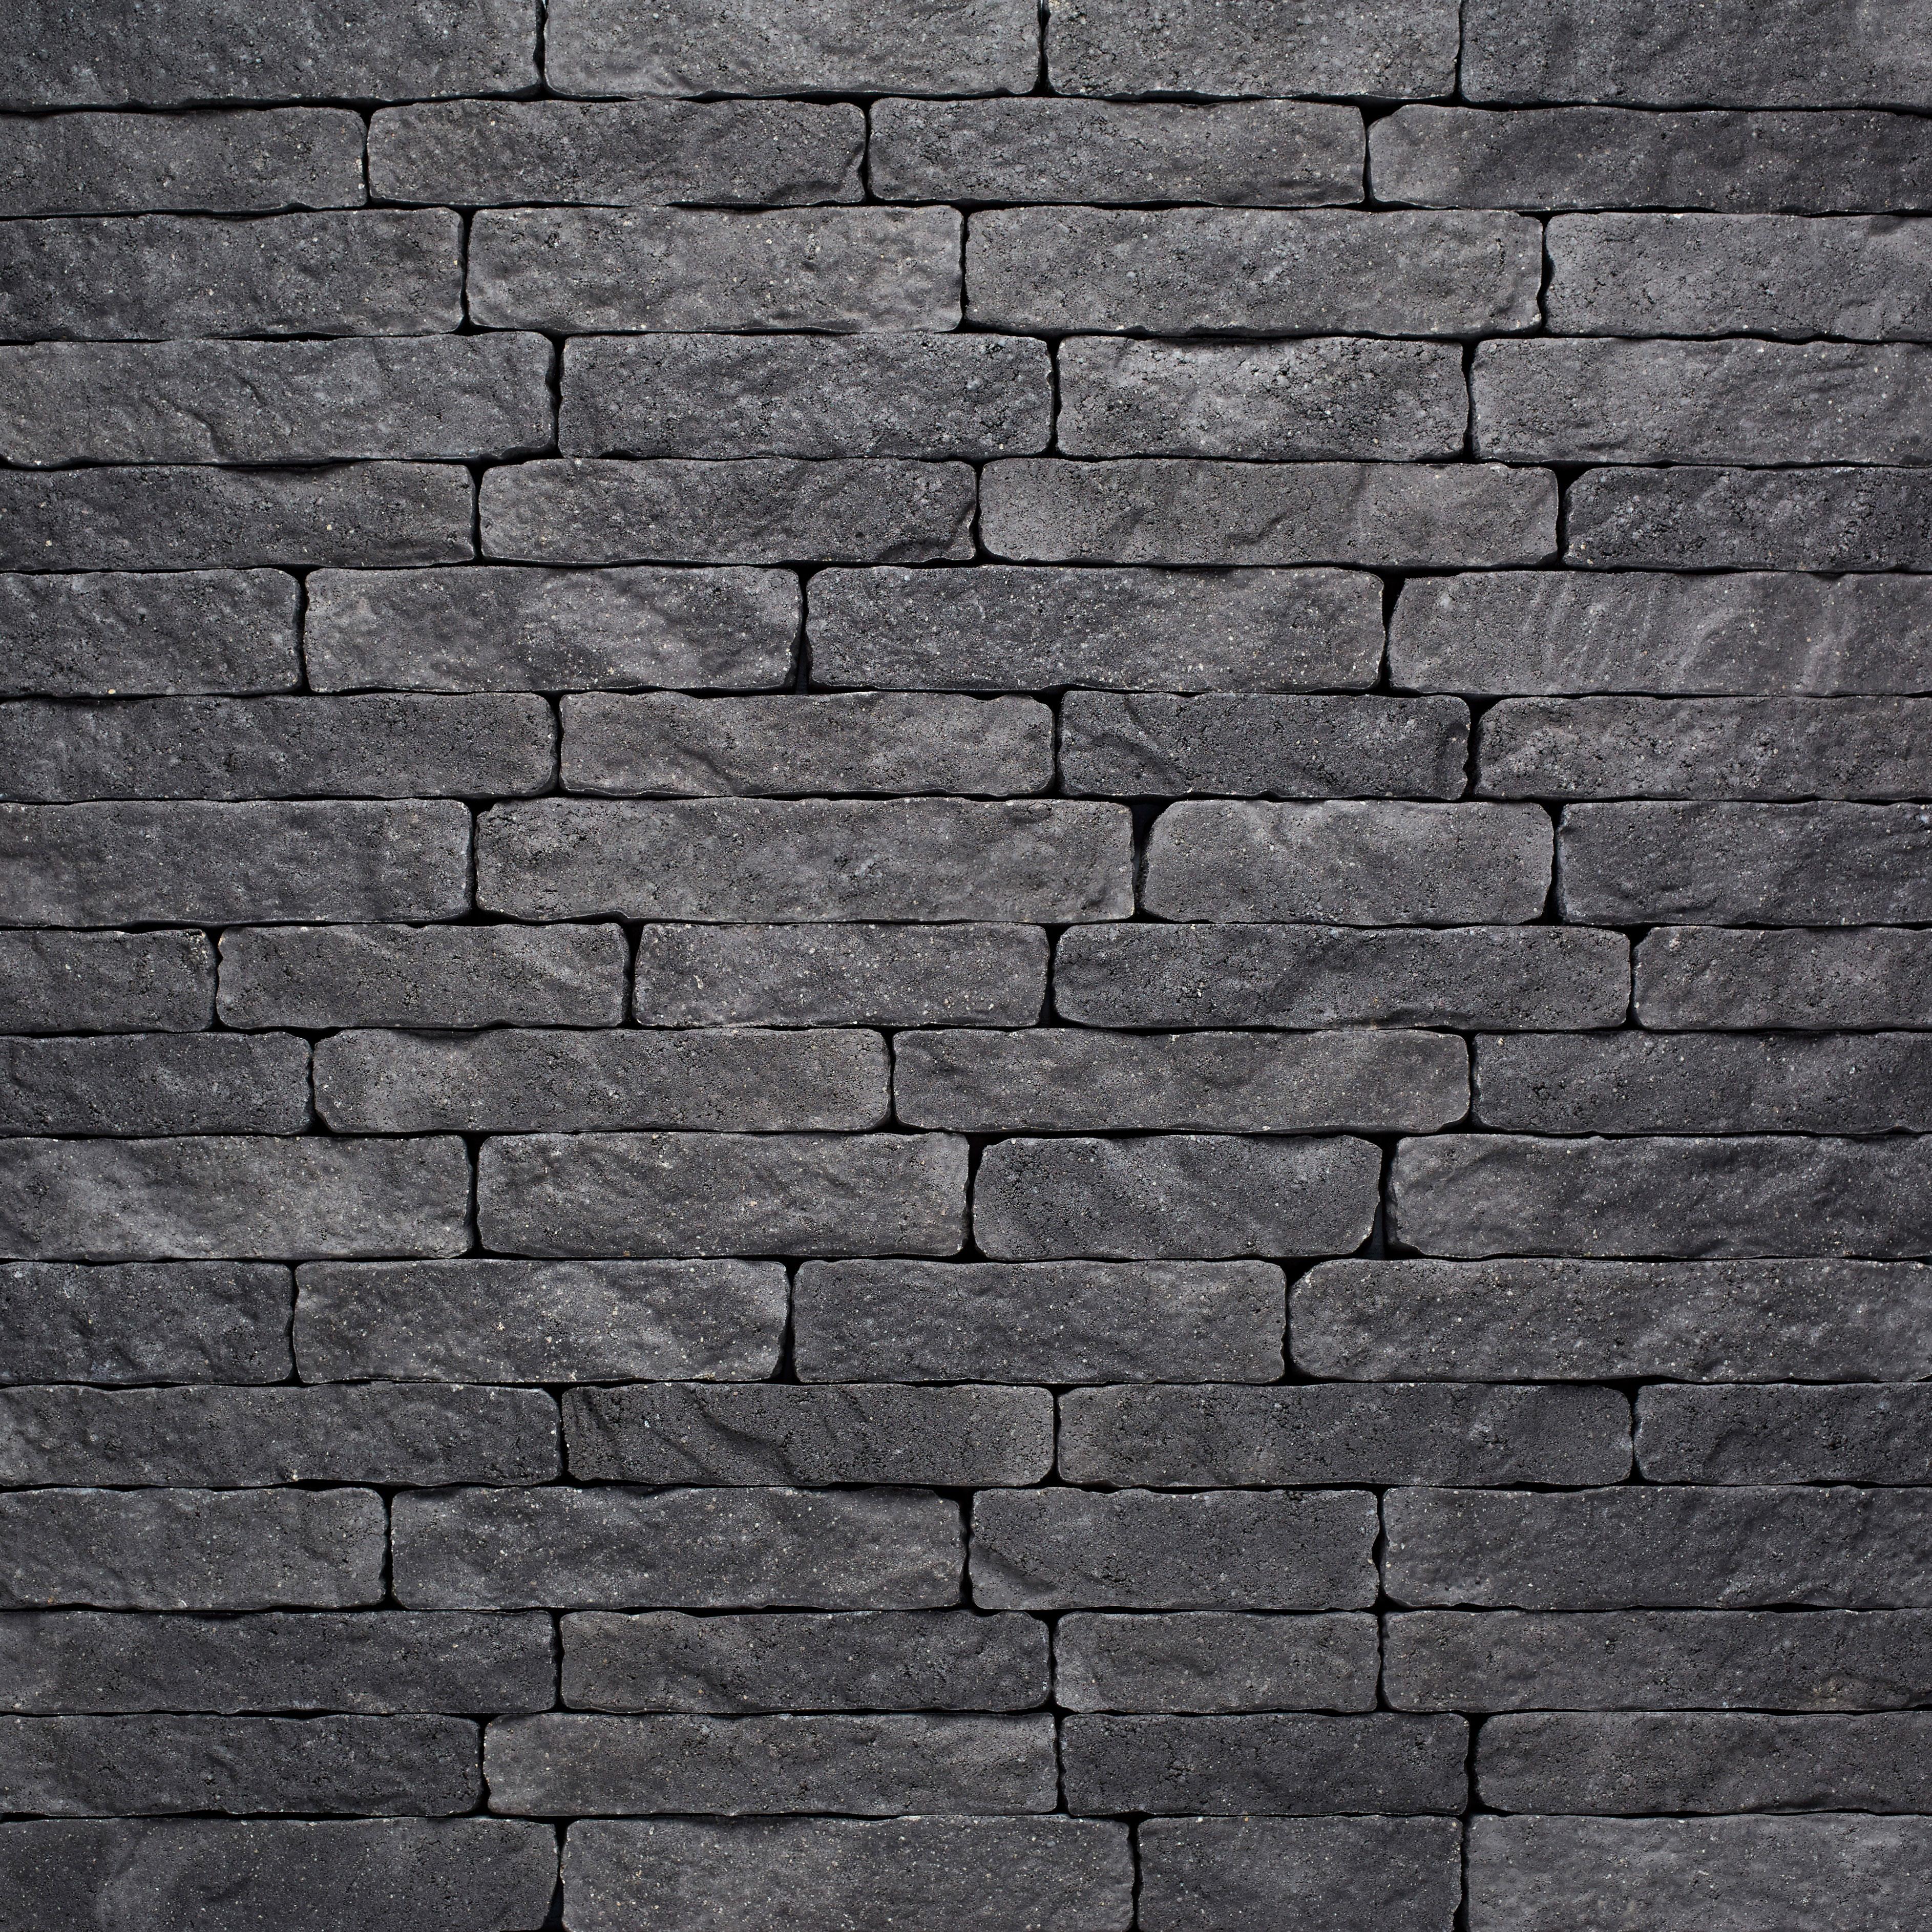 Kensley Stone Thin Artisan Masonry Veneers From Echelon: Stone Cladding: Cordova Stone Cast Veneers & CMUs By